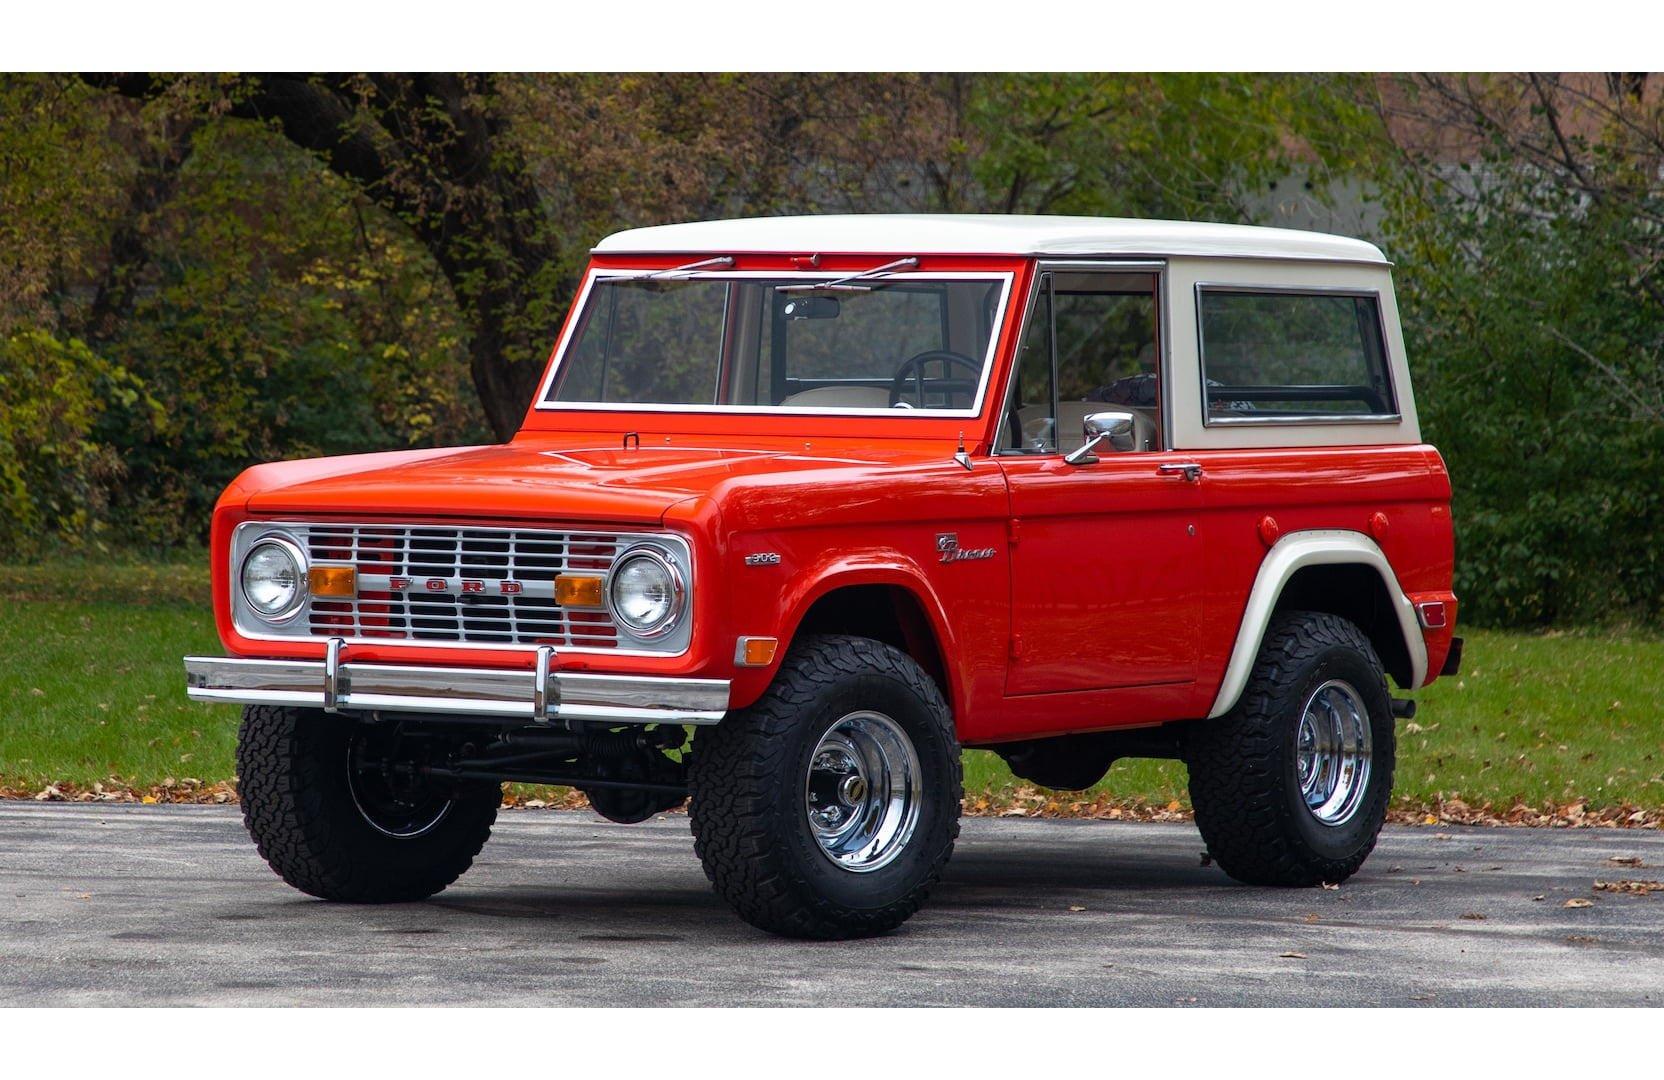 Holman Moody Ford Bronco Prototype - The Bronco Hunter